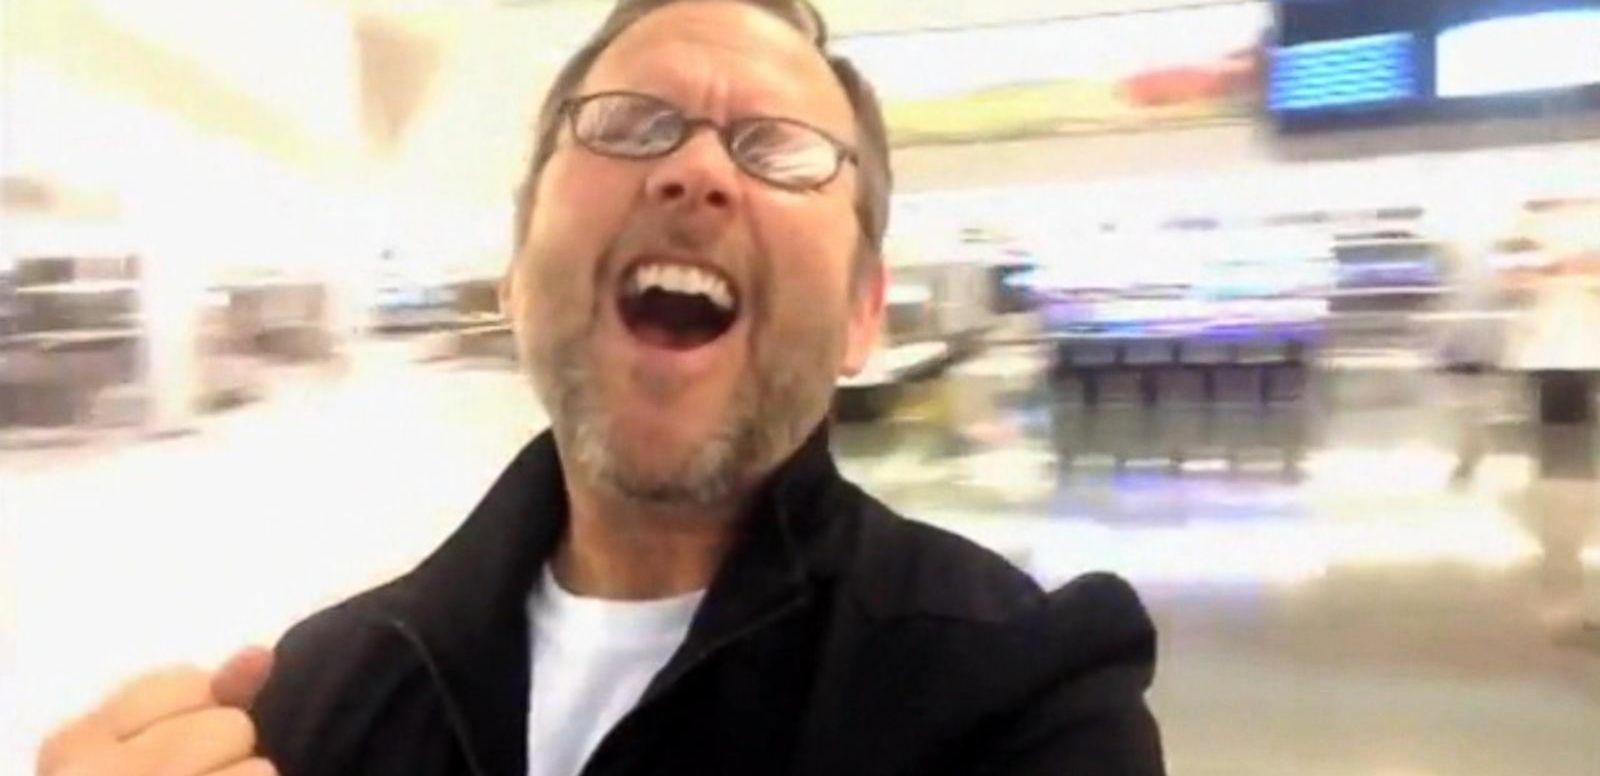 VIDEO: Epic Viral Video Countdown: Airport Lip-Sync Viral Sensation